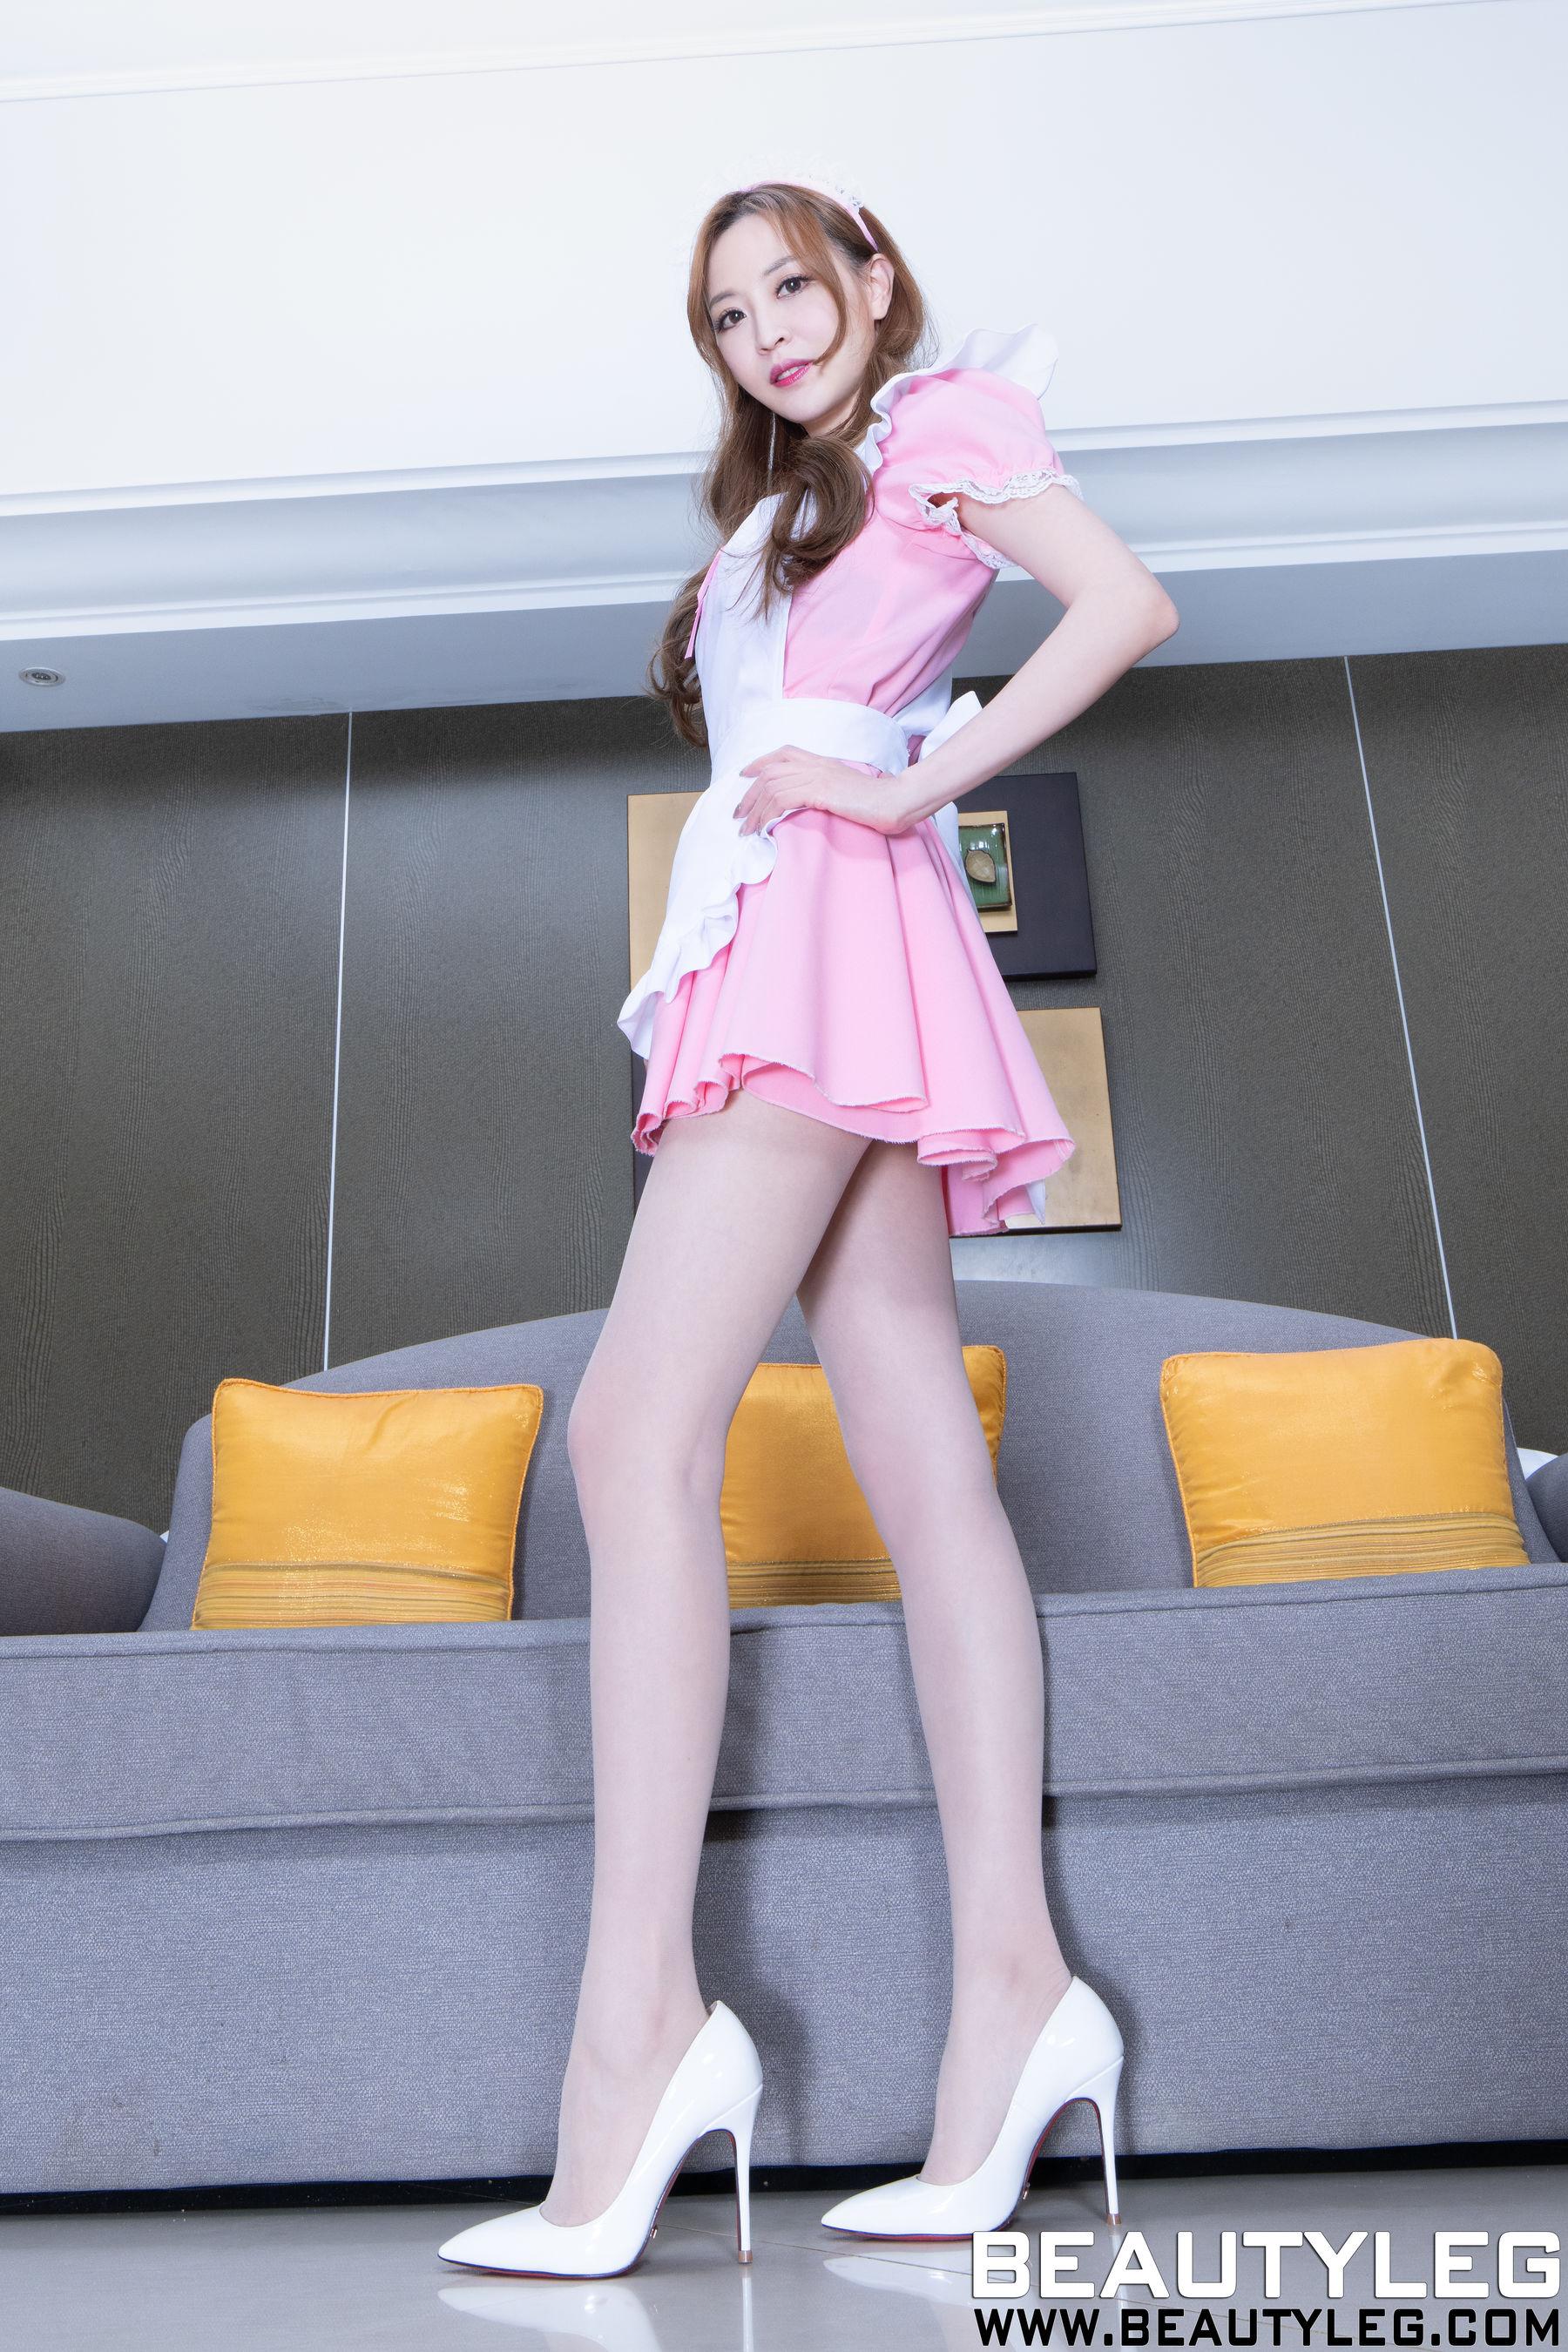 VOL.1652 [Beautyleg]丝袜制服:倪千凌(腿模Lucy,陈佳筠)超高清个人性感漂亮大图(67P)